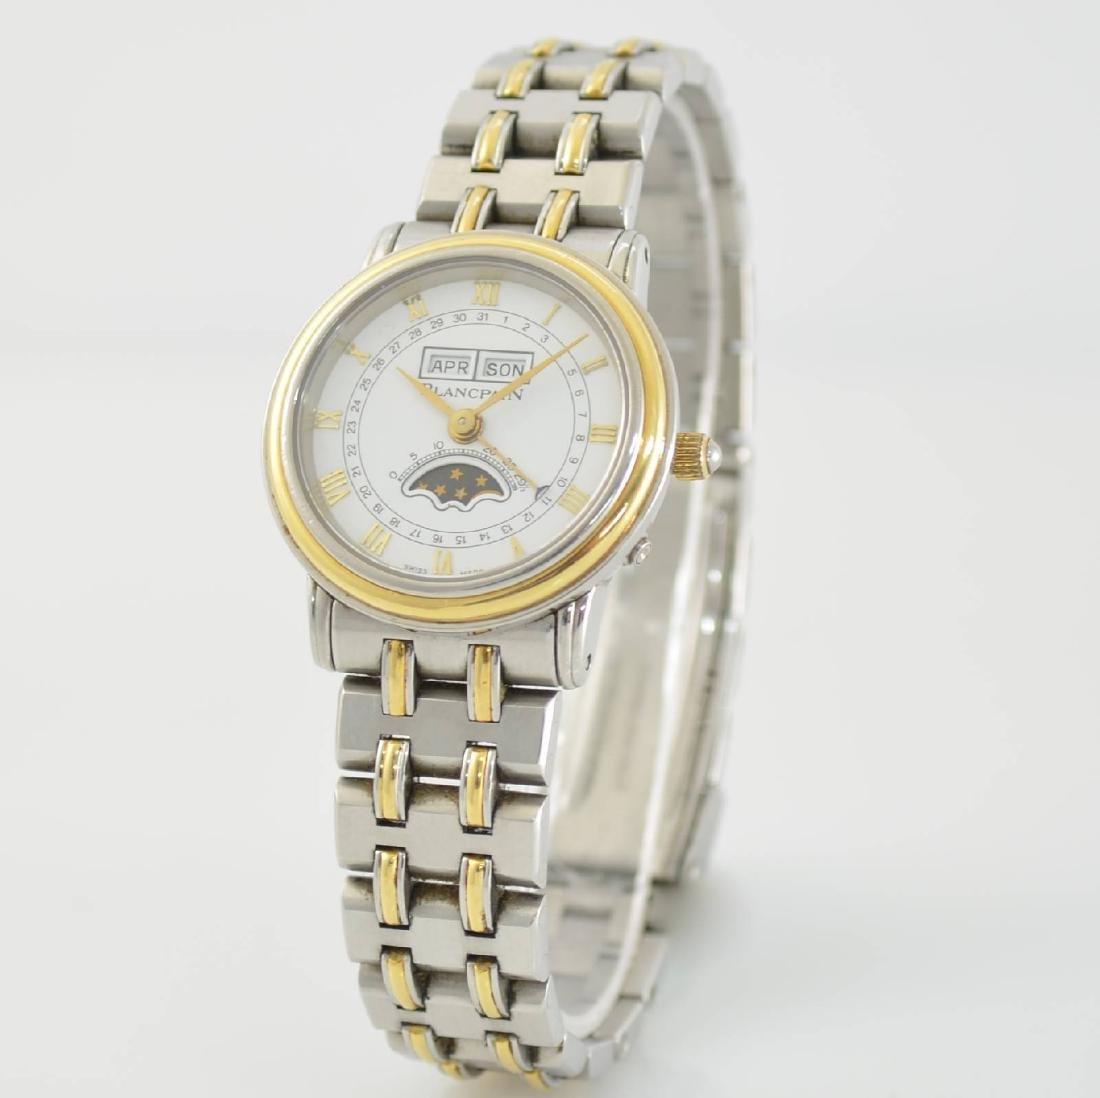 BLANCPAIN ladies wristwatch with complete calendar - 3